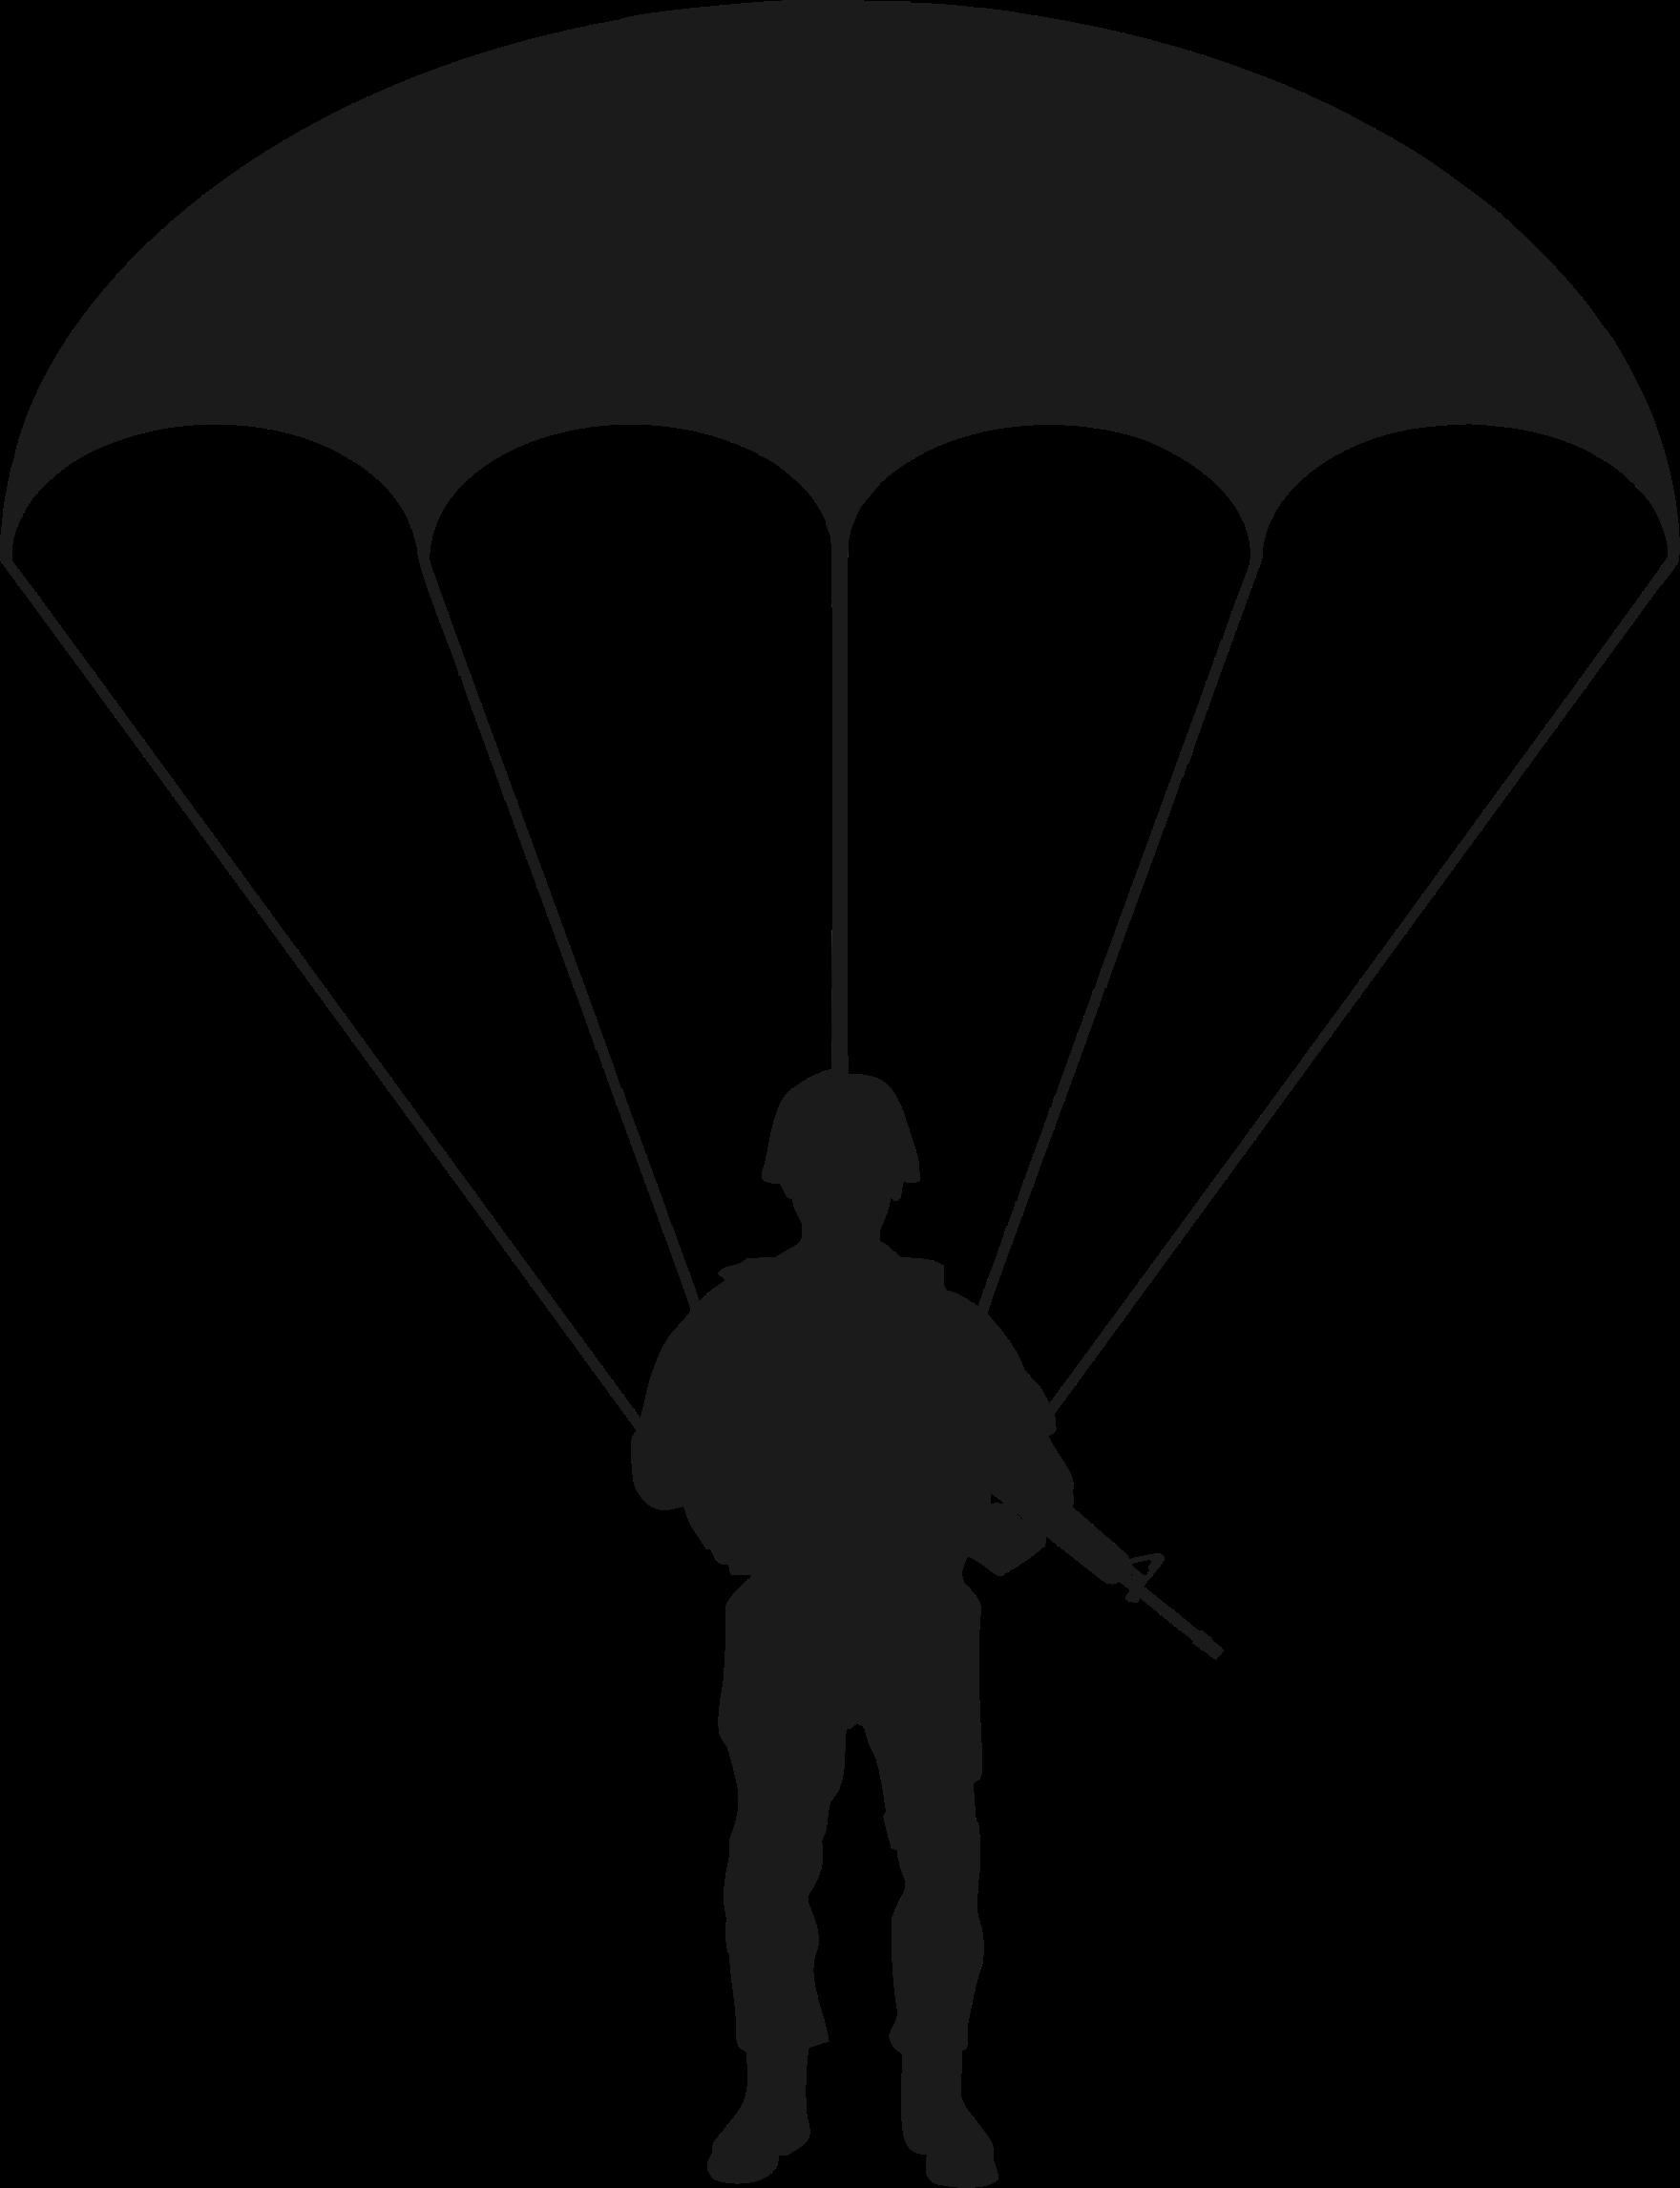 clip transparent download Parachute clipart. Silhouette free on dumielauxepices